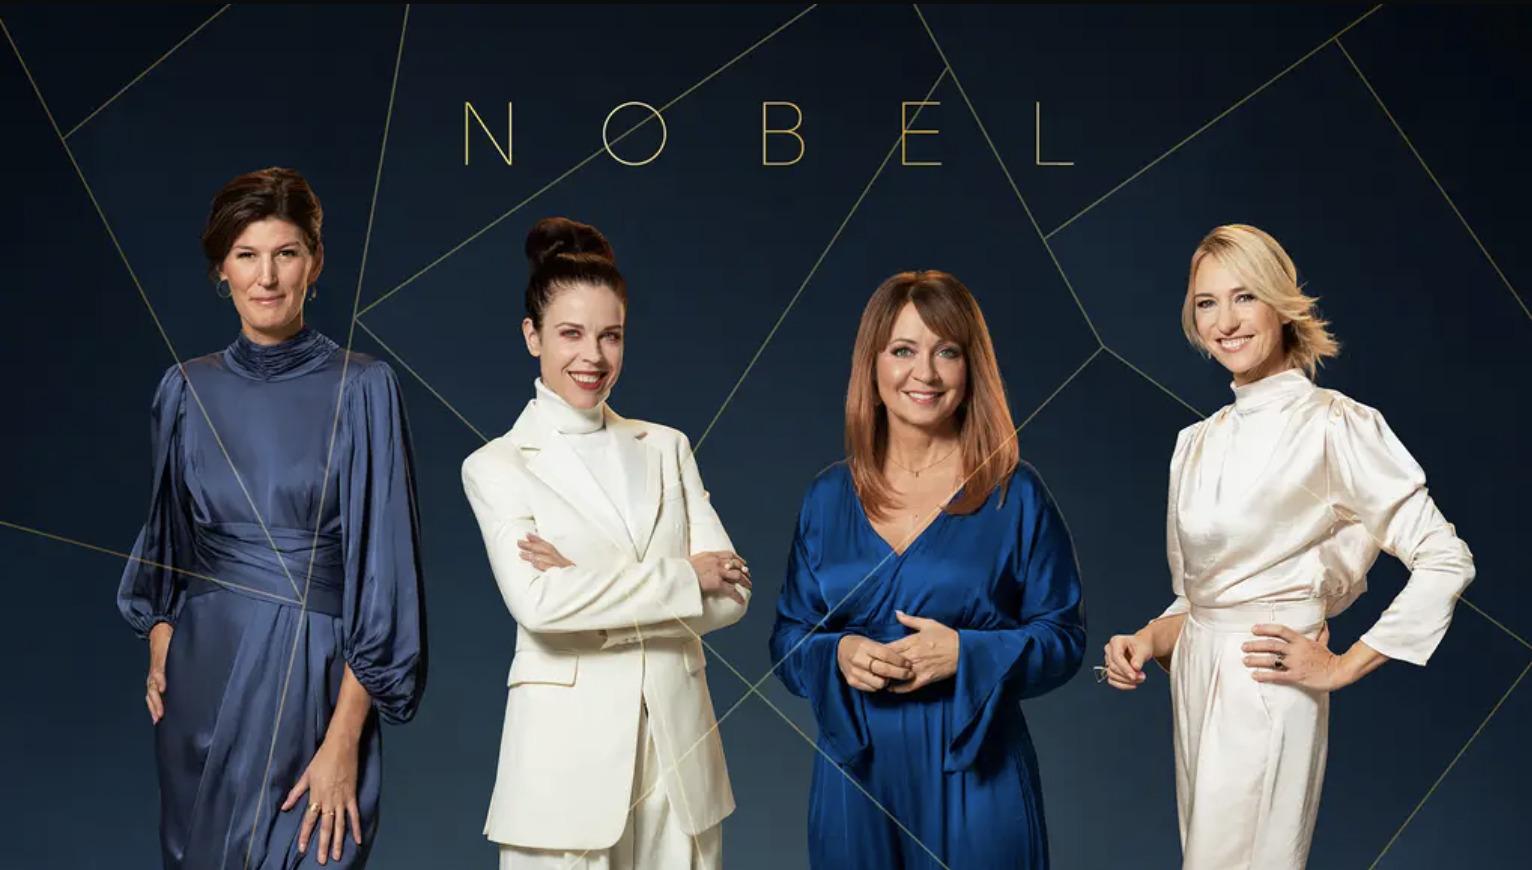 The Nobel Prize: An evening for Nobel